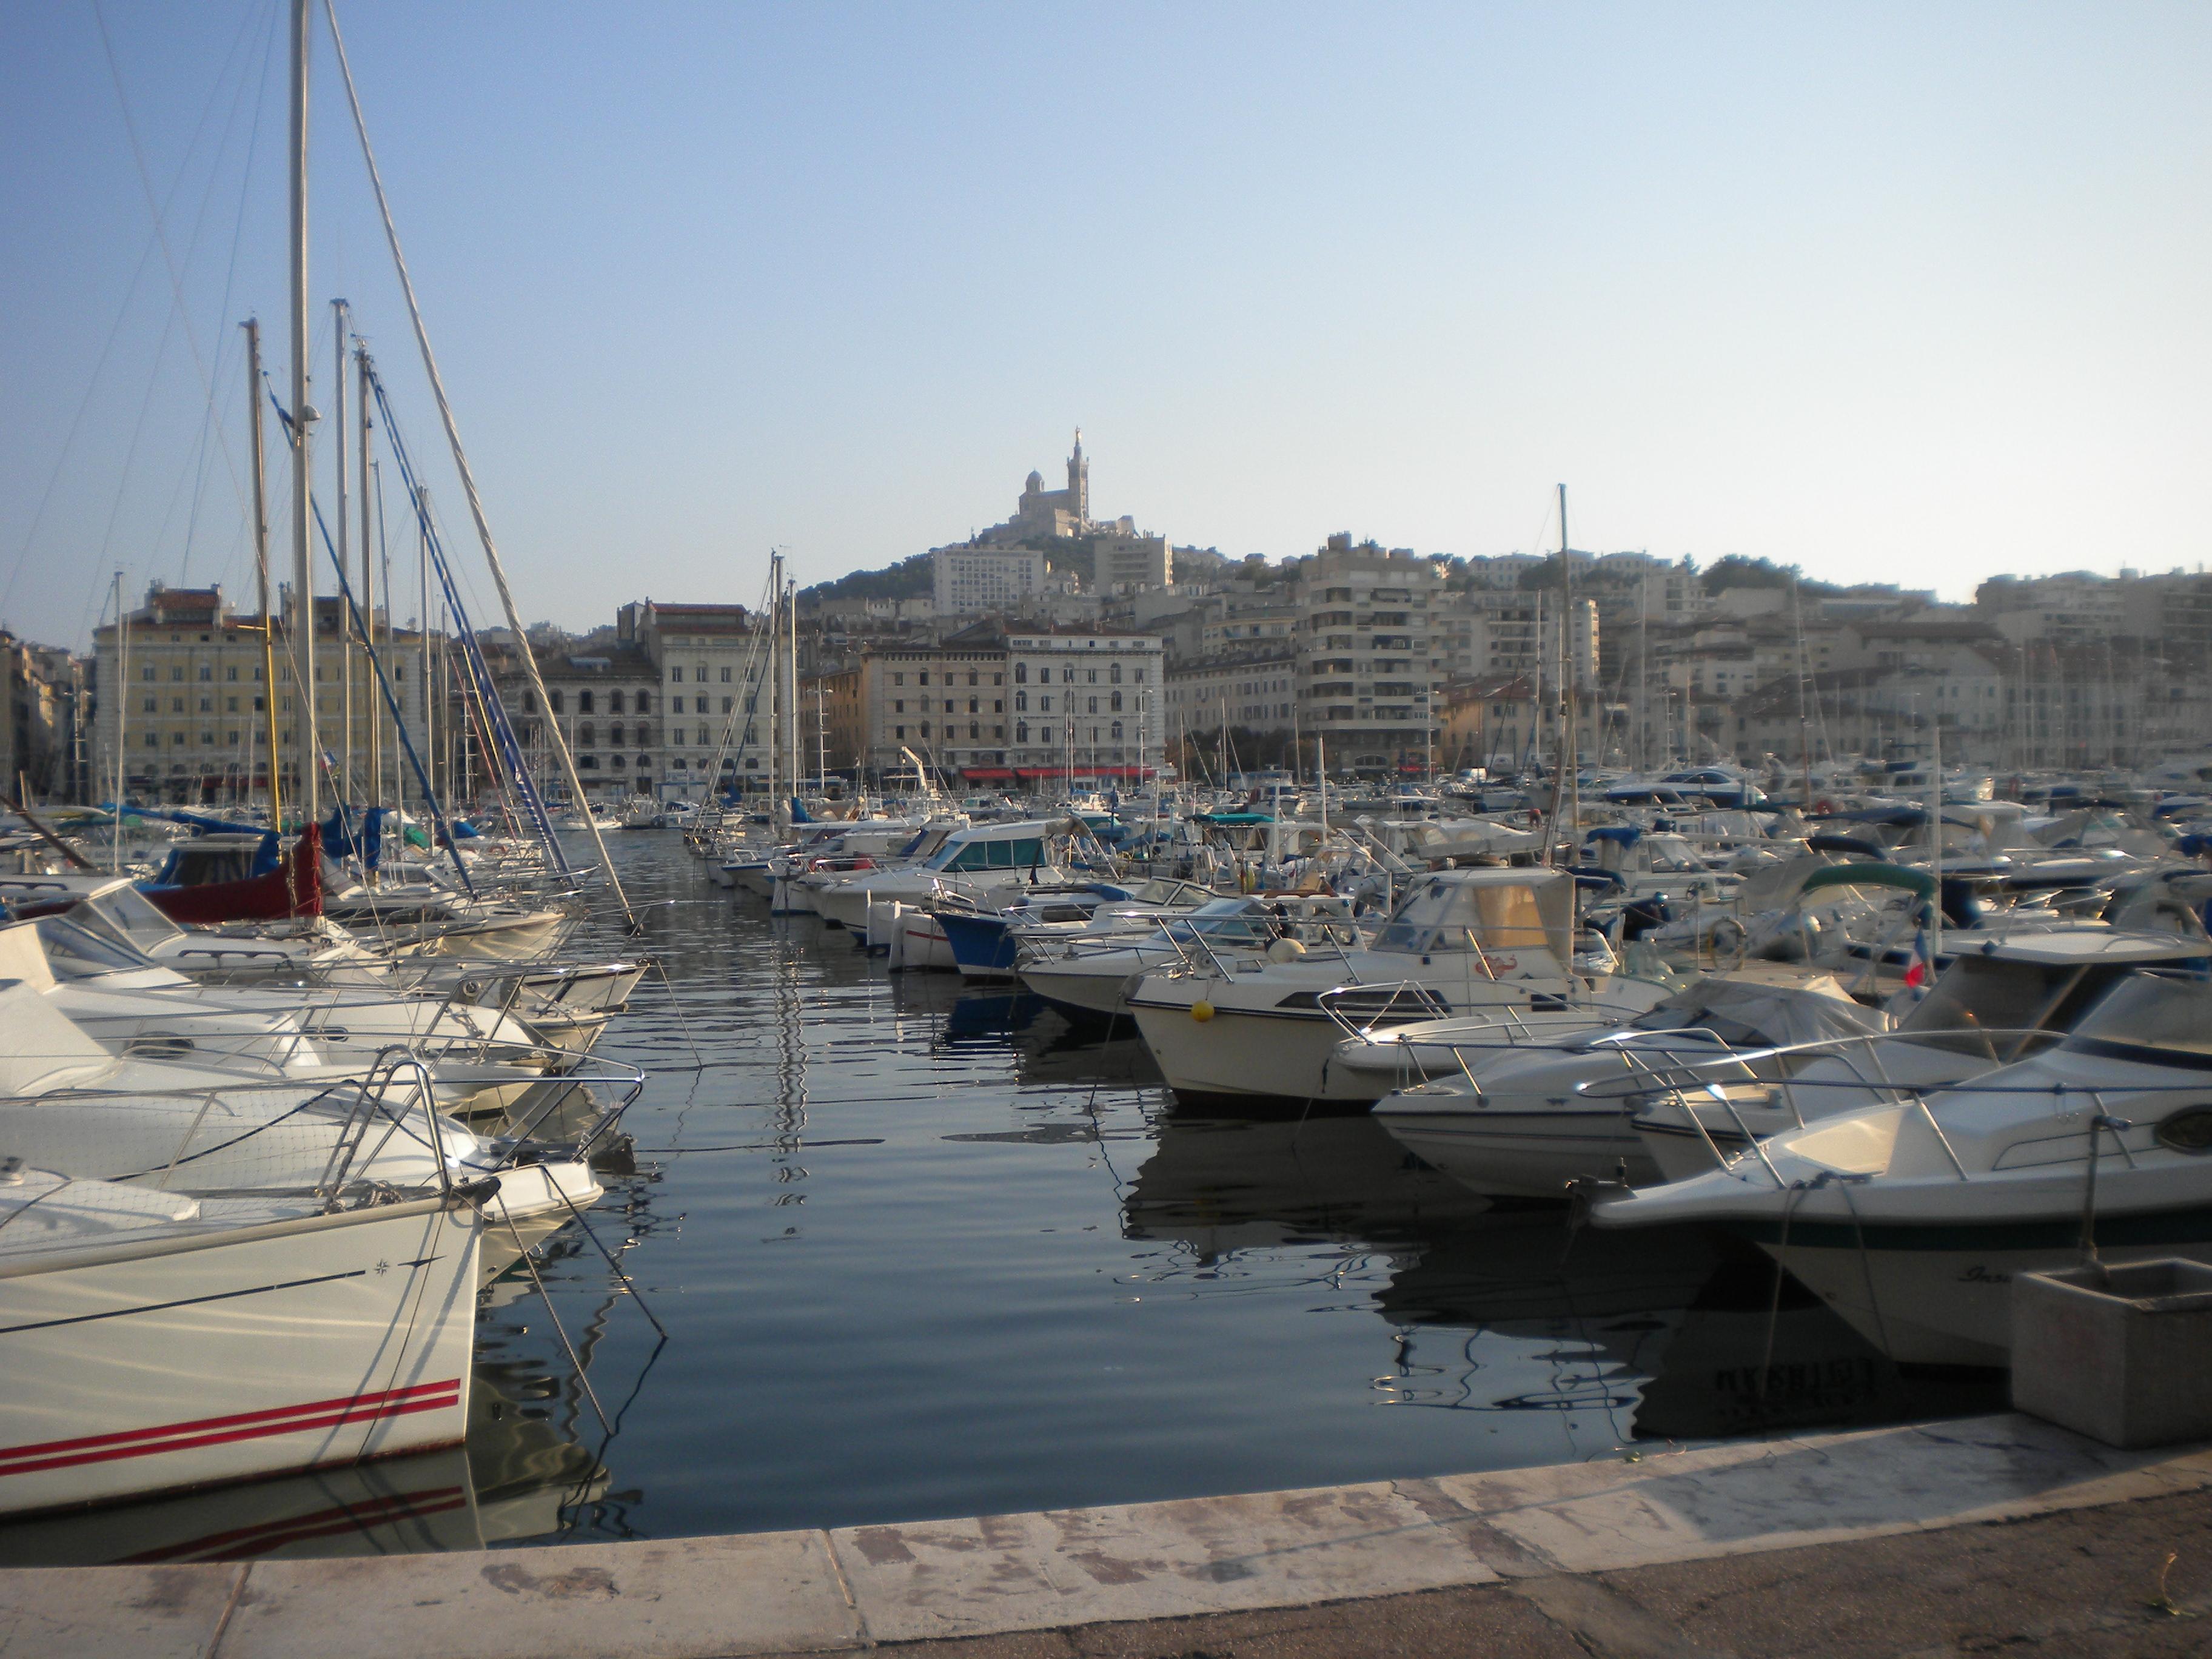 Vieux port harbor 8 temporarily lost - Bouillabaisse marseille vieux port ...